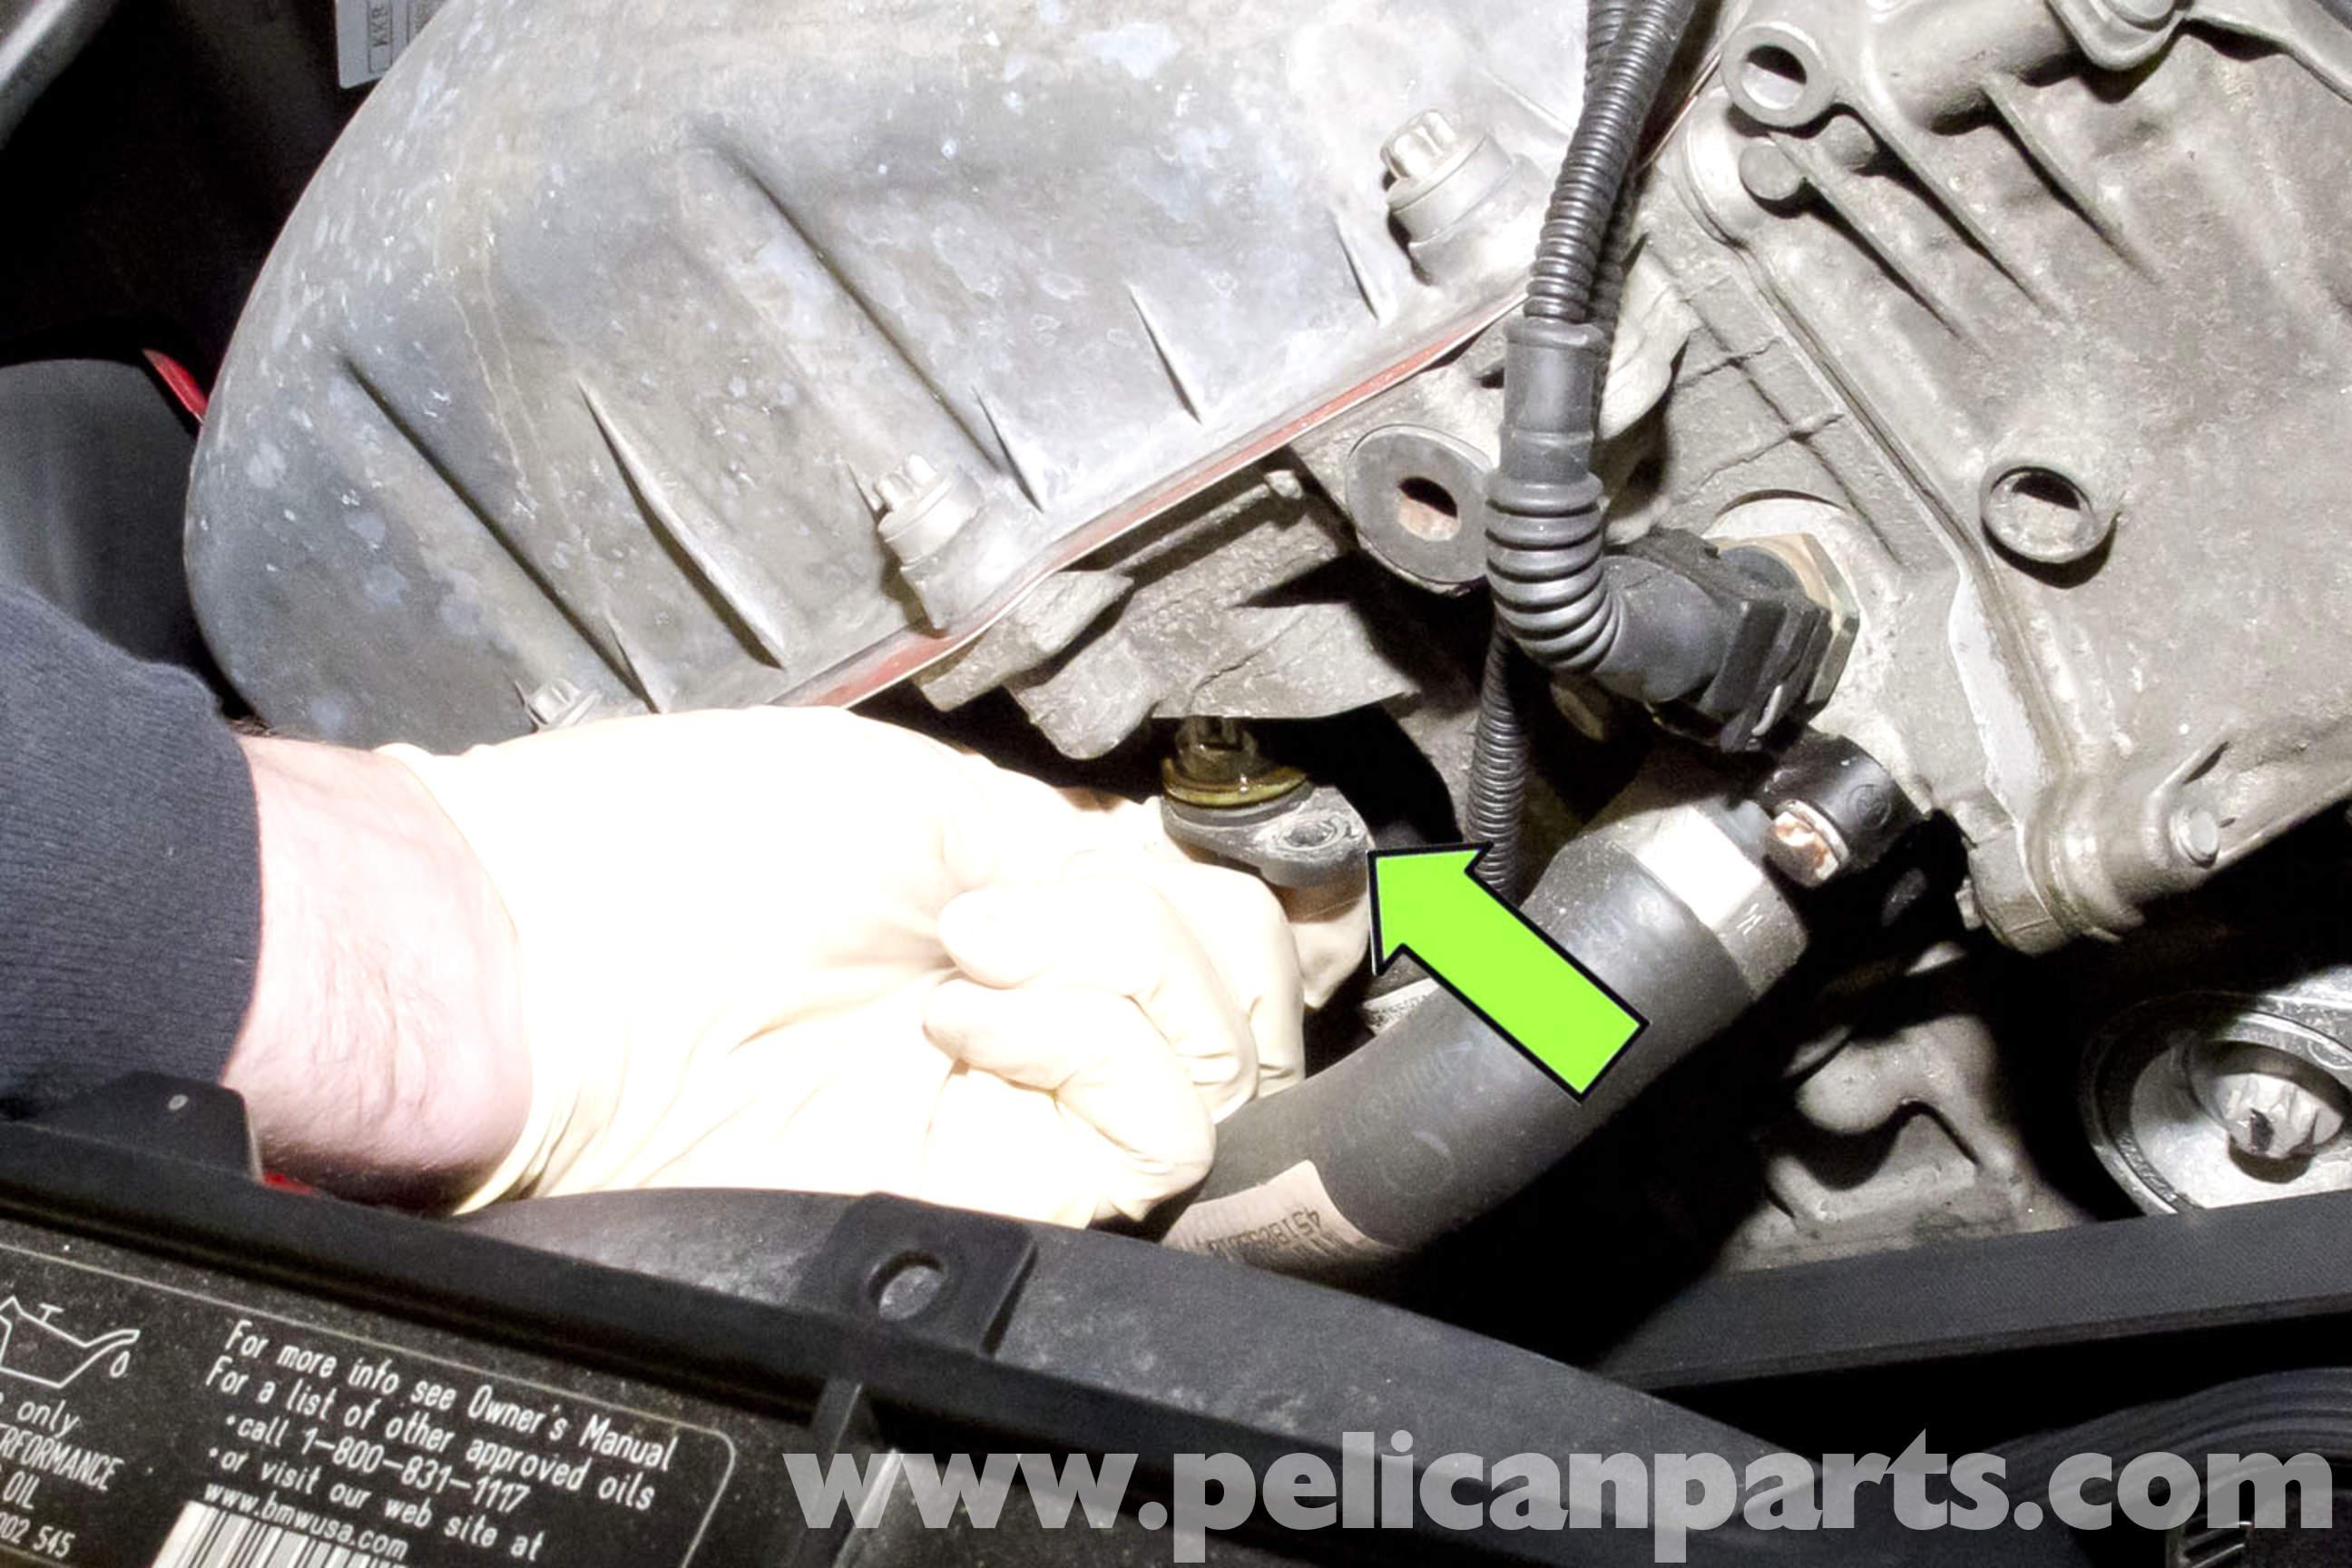 Wiring Diagram Bmw E23 Harness Connectors Male Car Photo E90 Camshaft Position Sensor Replacement E91 E92